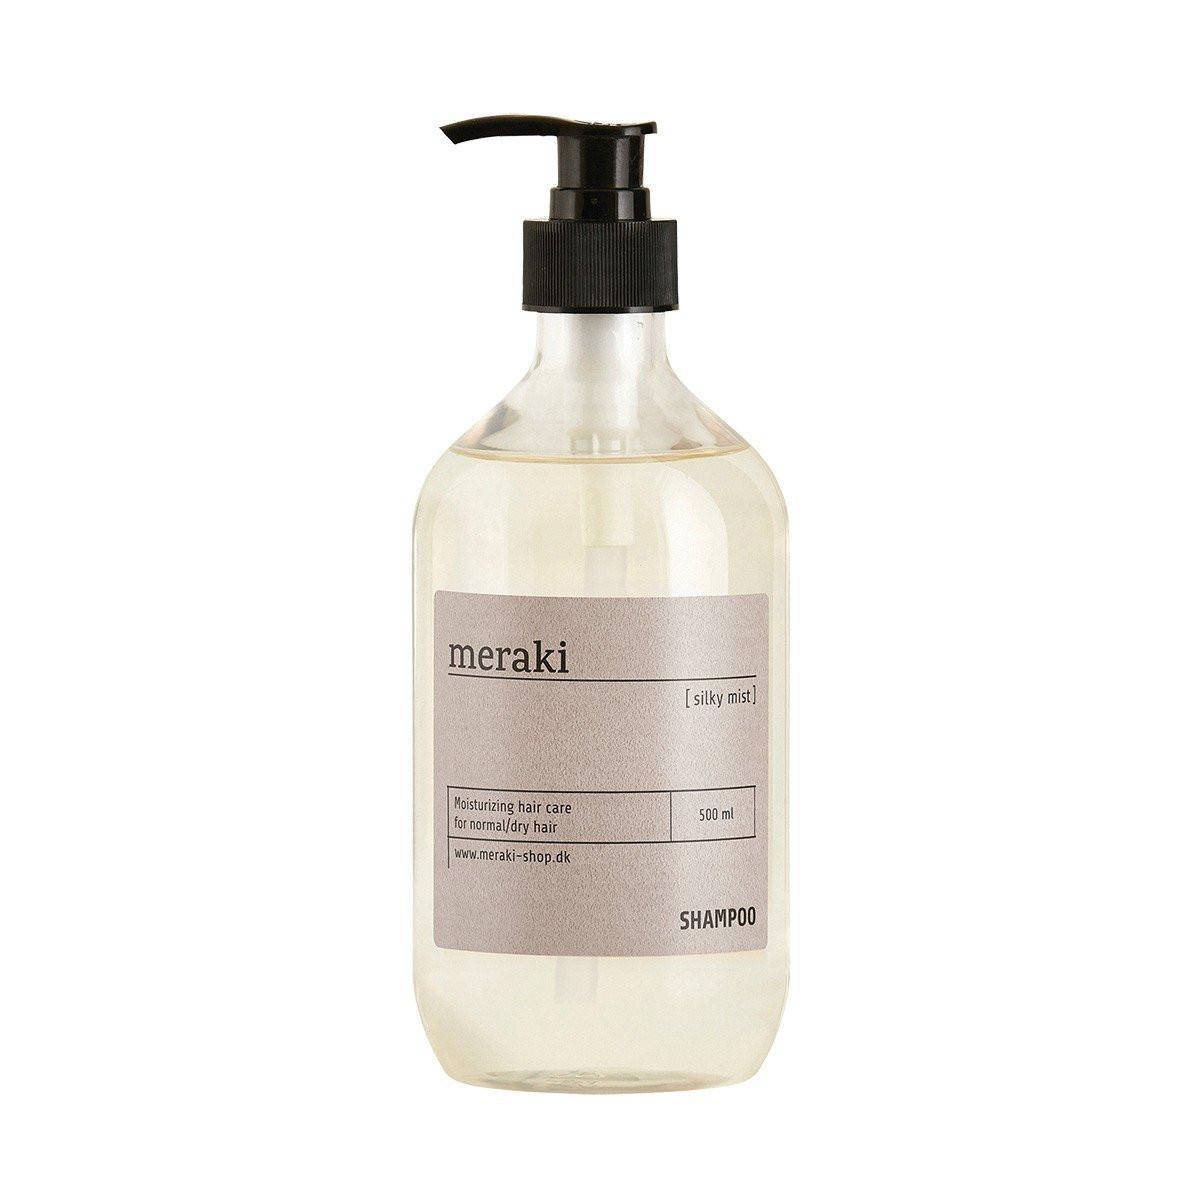 designstuff-meraki-shampoo-silky-mist.jpg